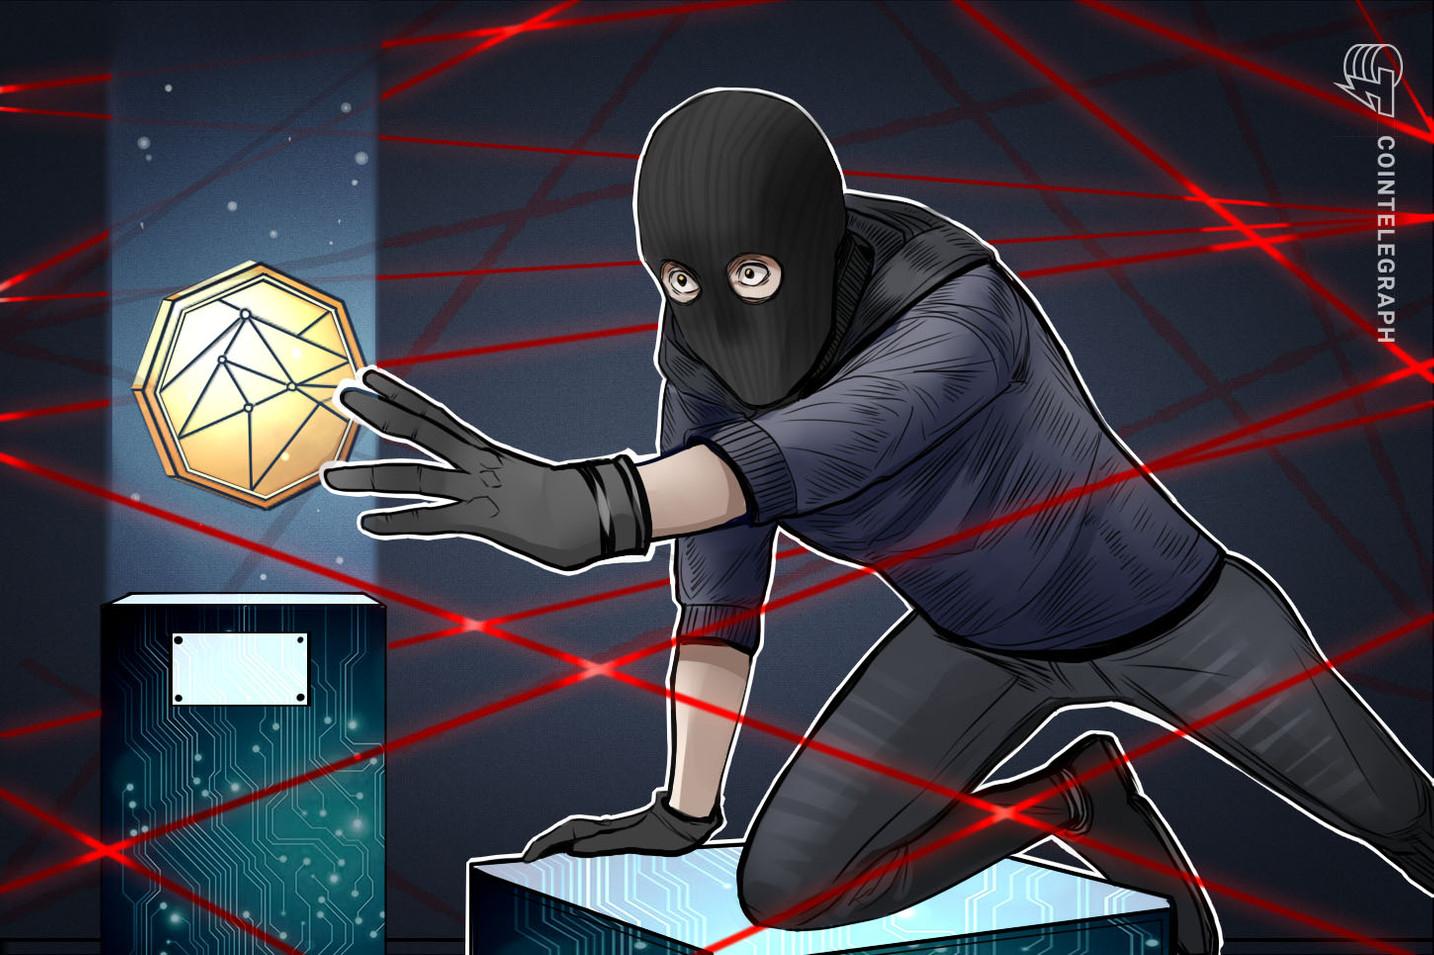 Krypto-Betrüger erzielen im März trotz Corona 30 Prozent weniger Gewinn